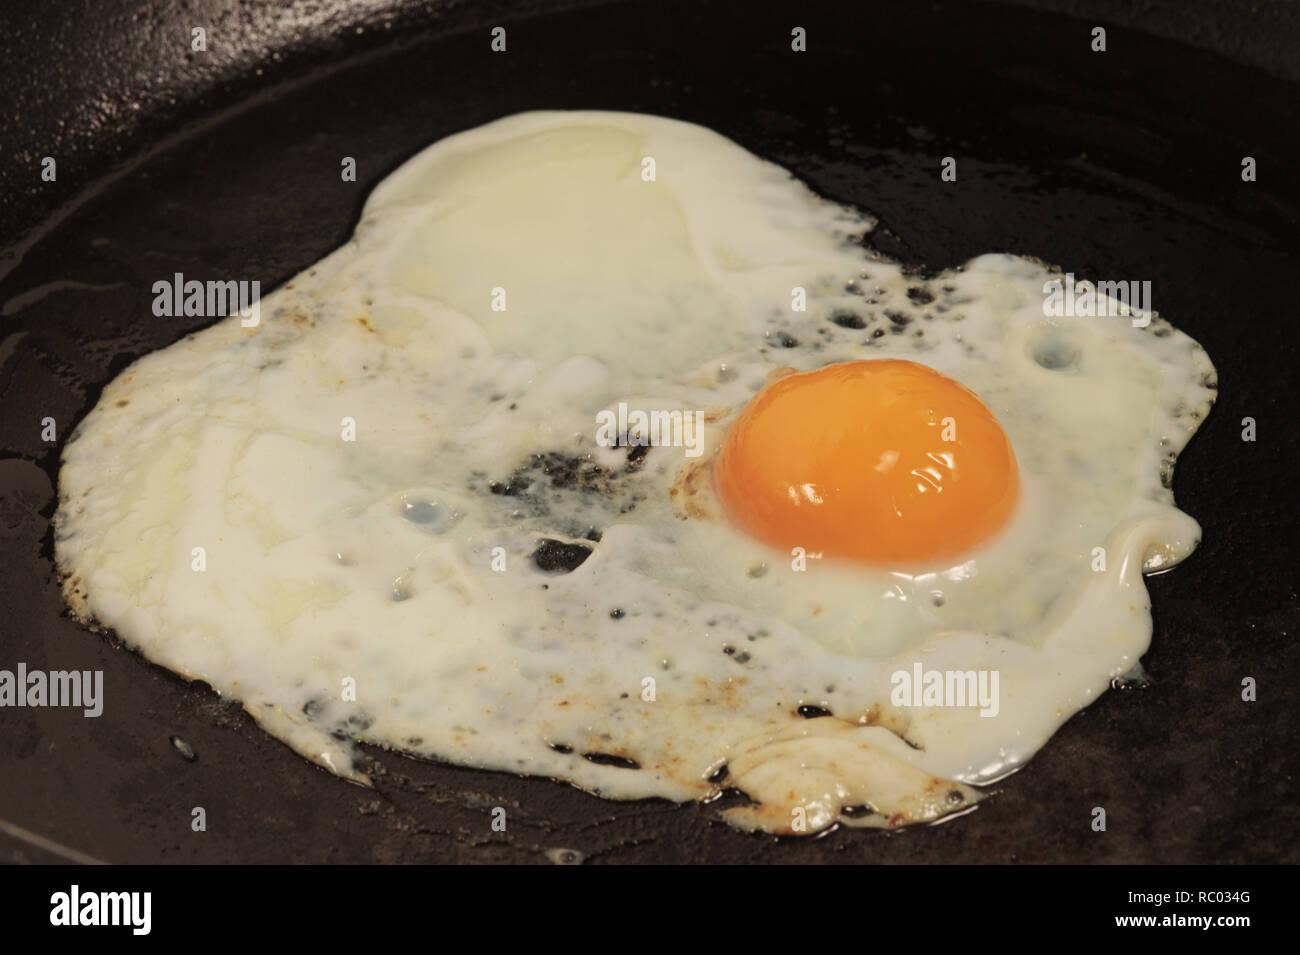 Ei, Pfanne, braten | Egg, pan, roast - Stock Image